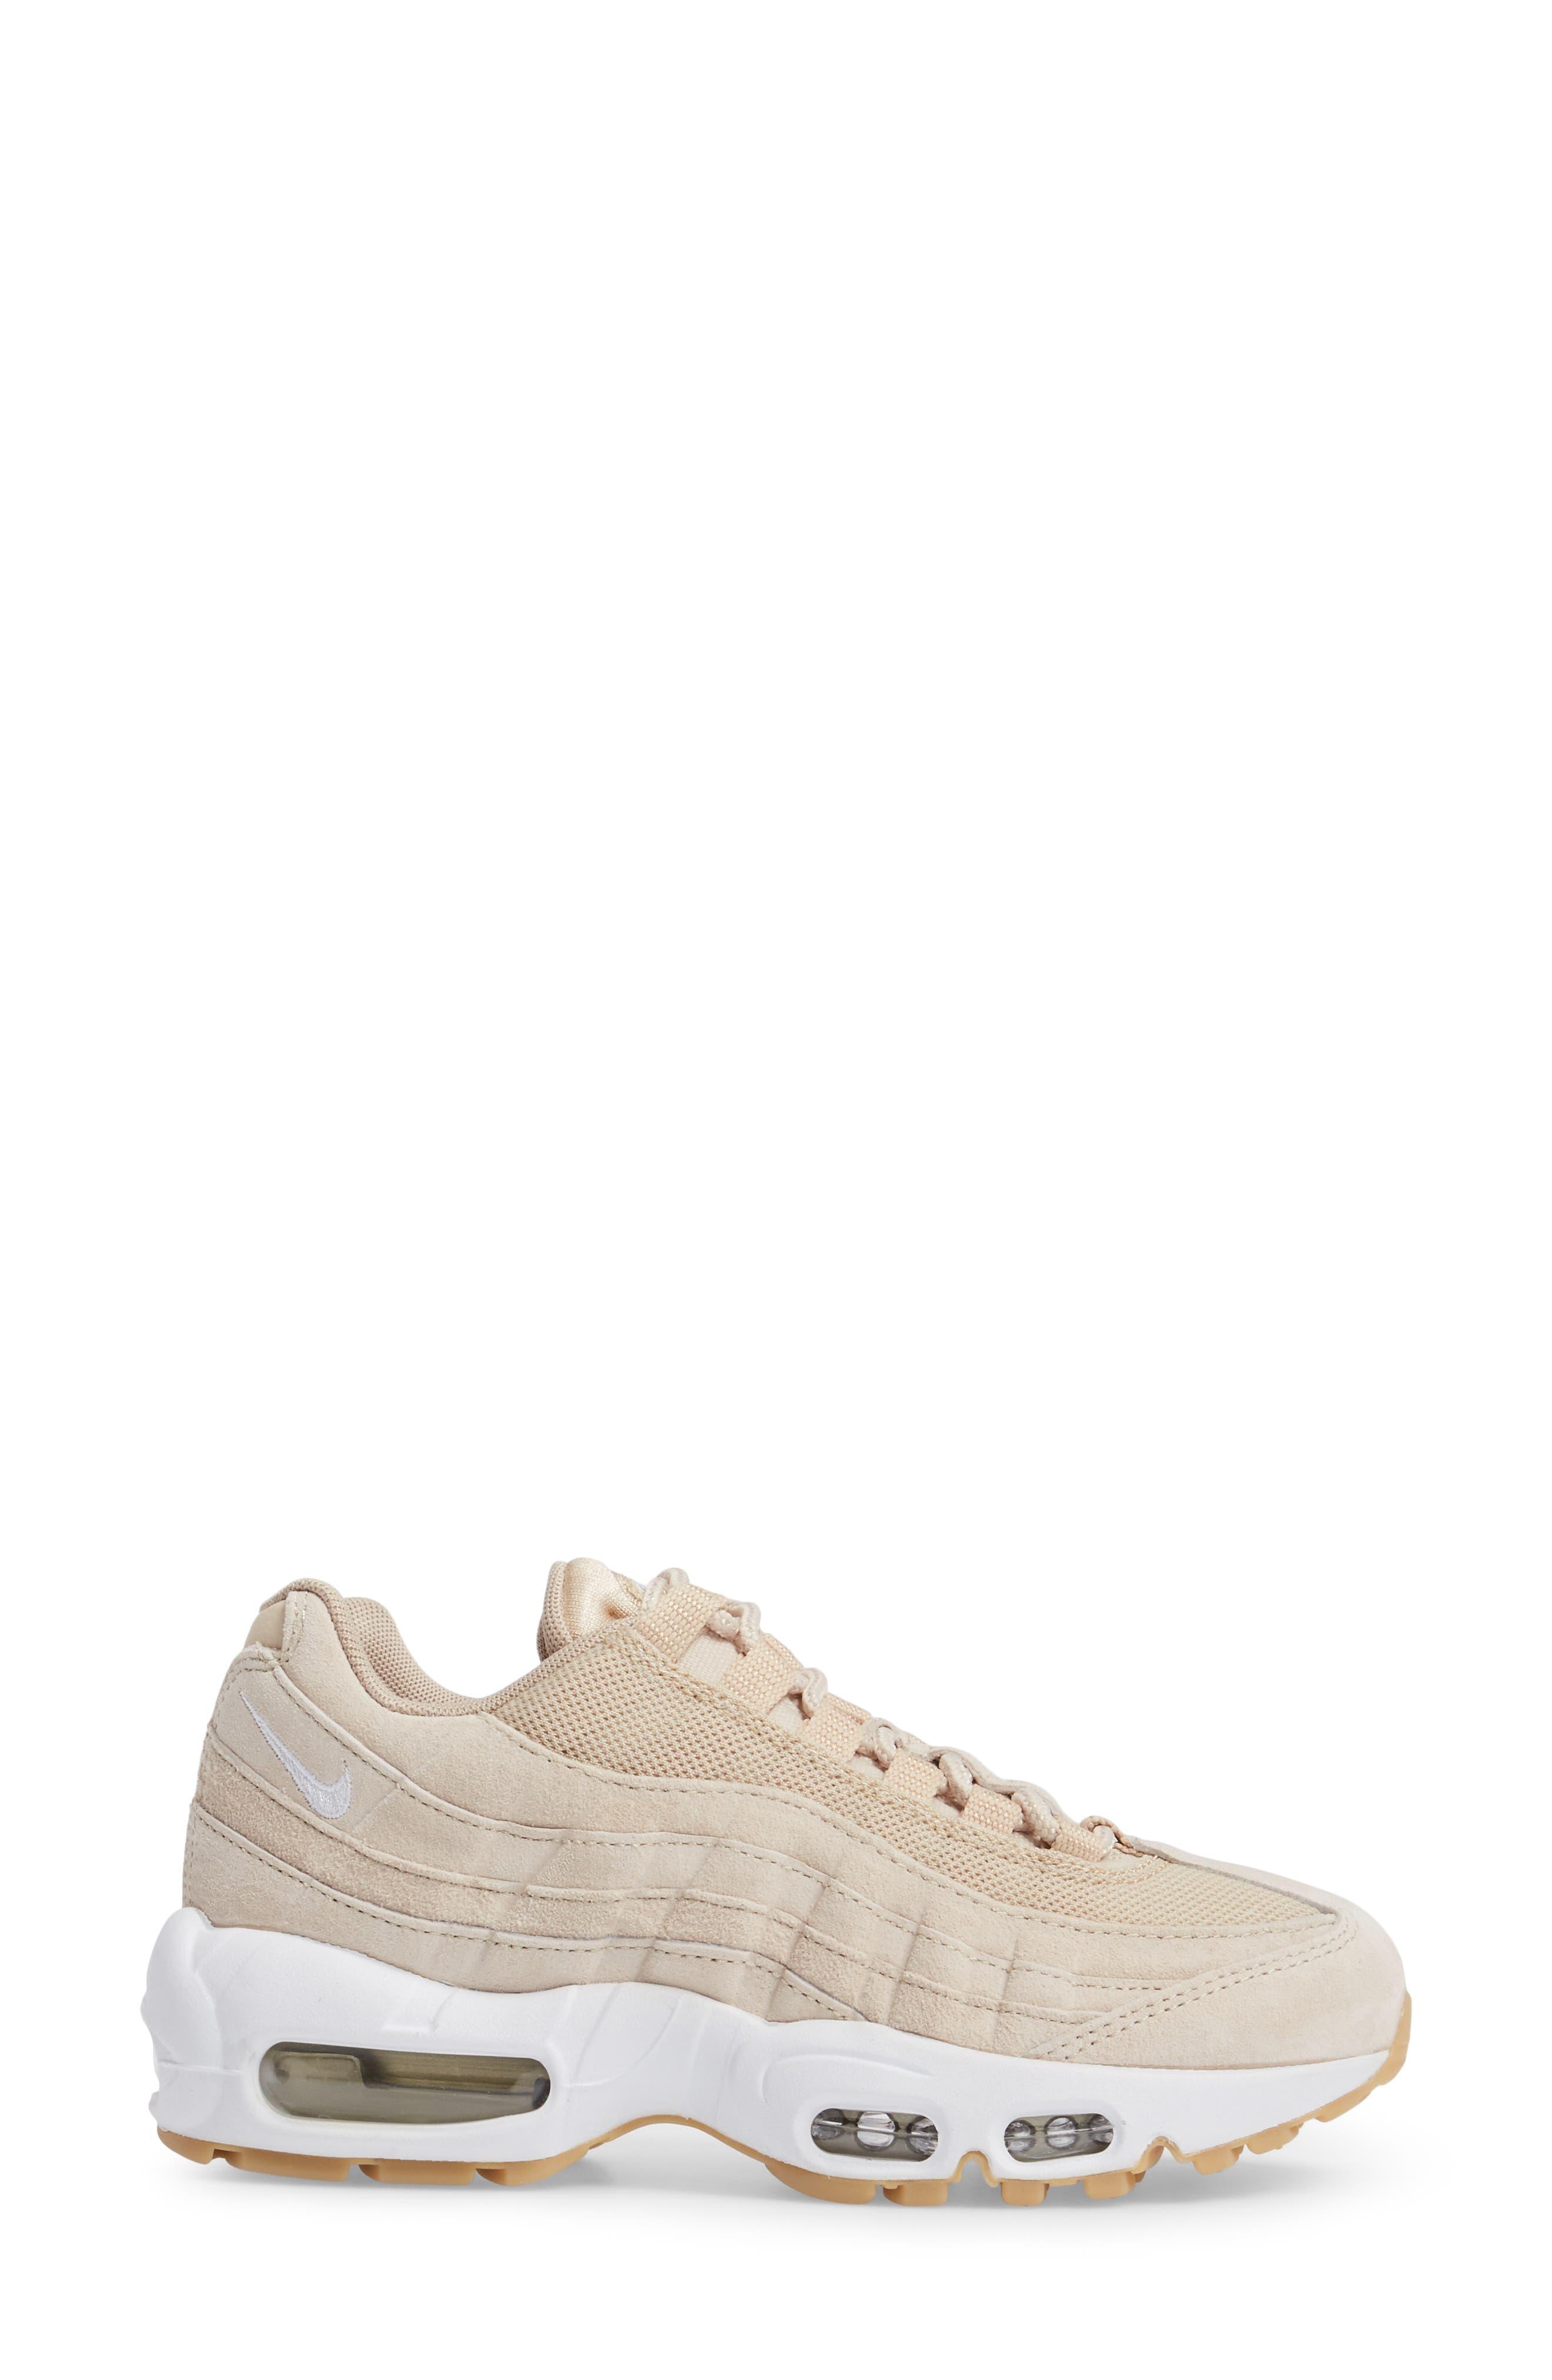 Air Max 95 SD Sneaker,                             Alternate thumbnail 3, color,                             250